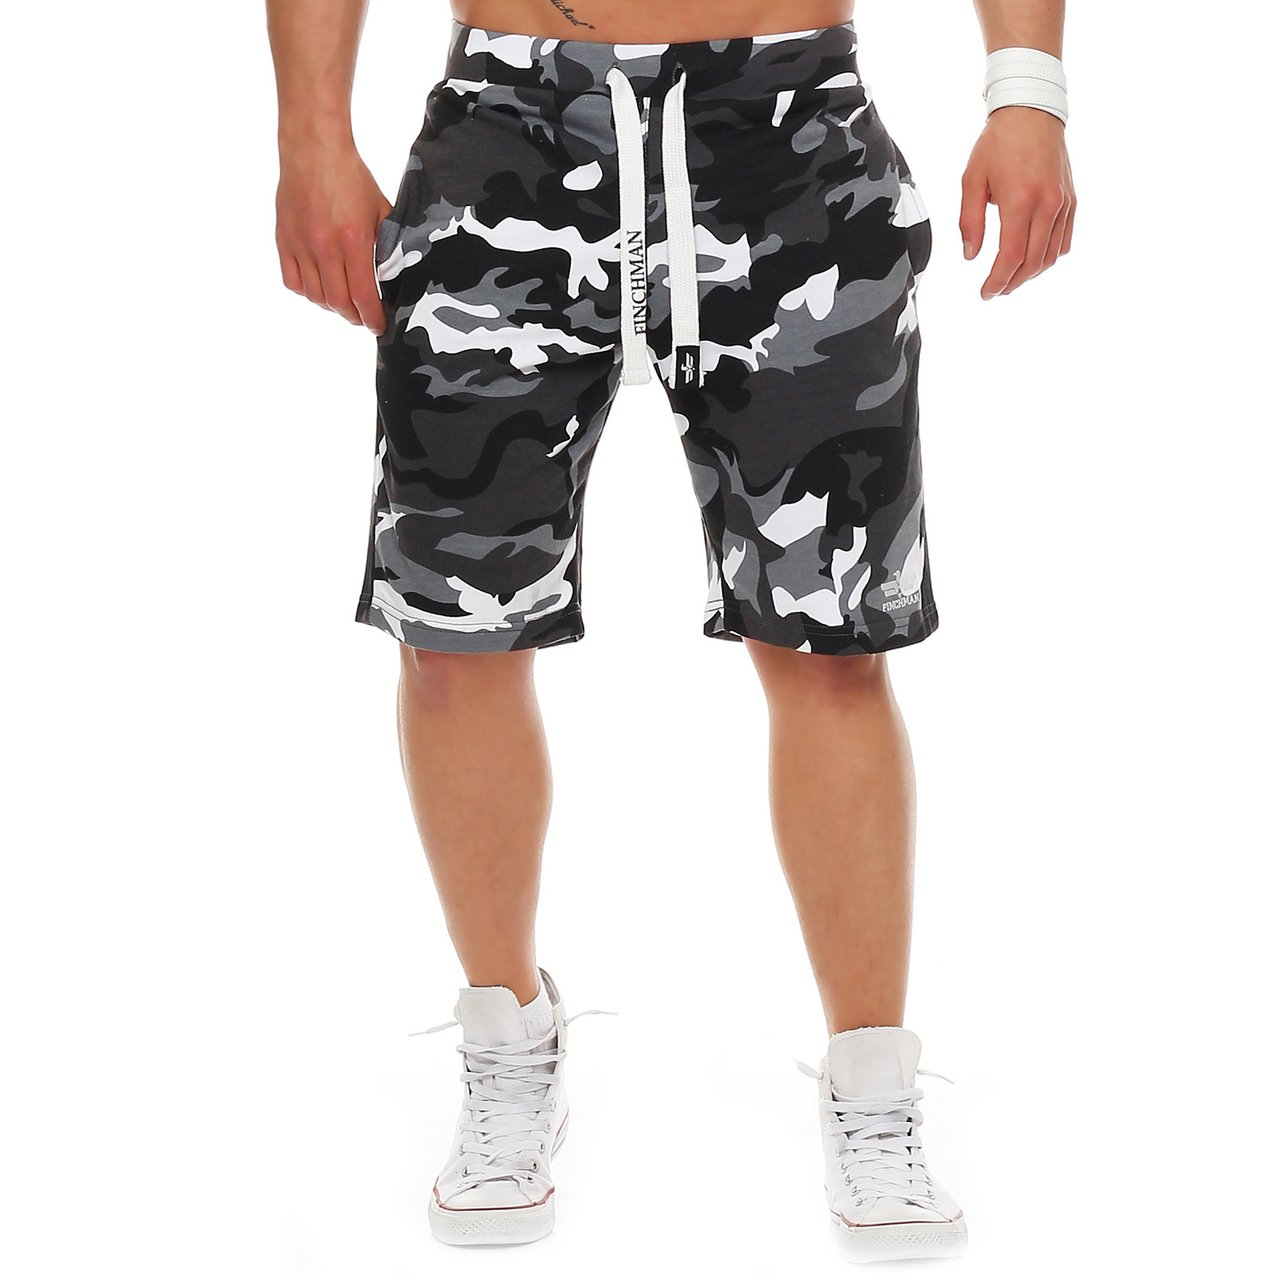 544f9a6e6a6ba Finchman Pantalones Cortos Deportivos de algodón para Hombres Bermuda  Sweatpant product image